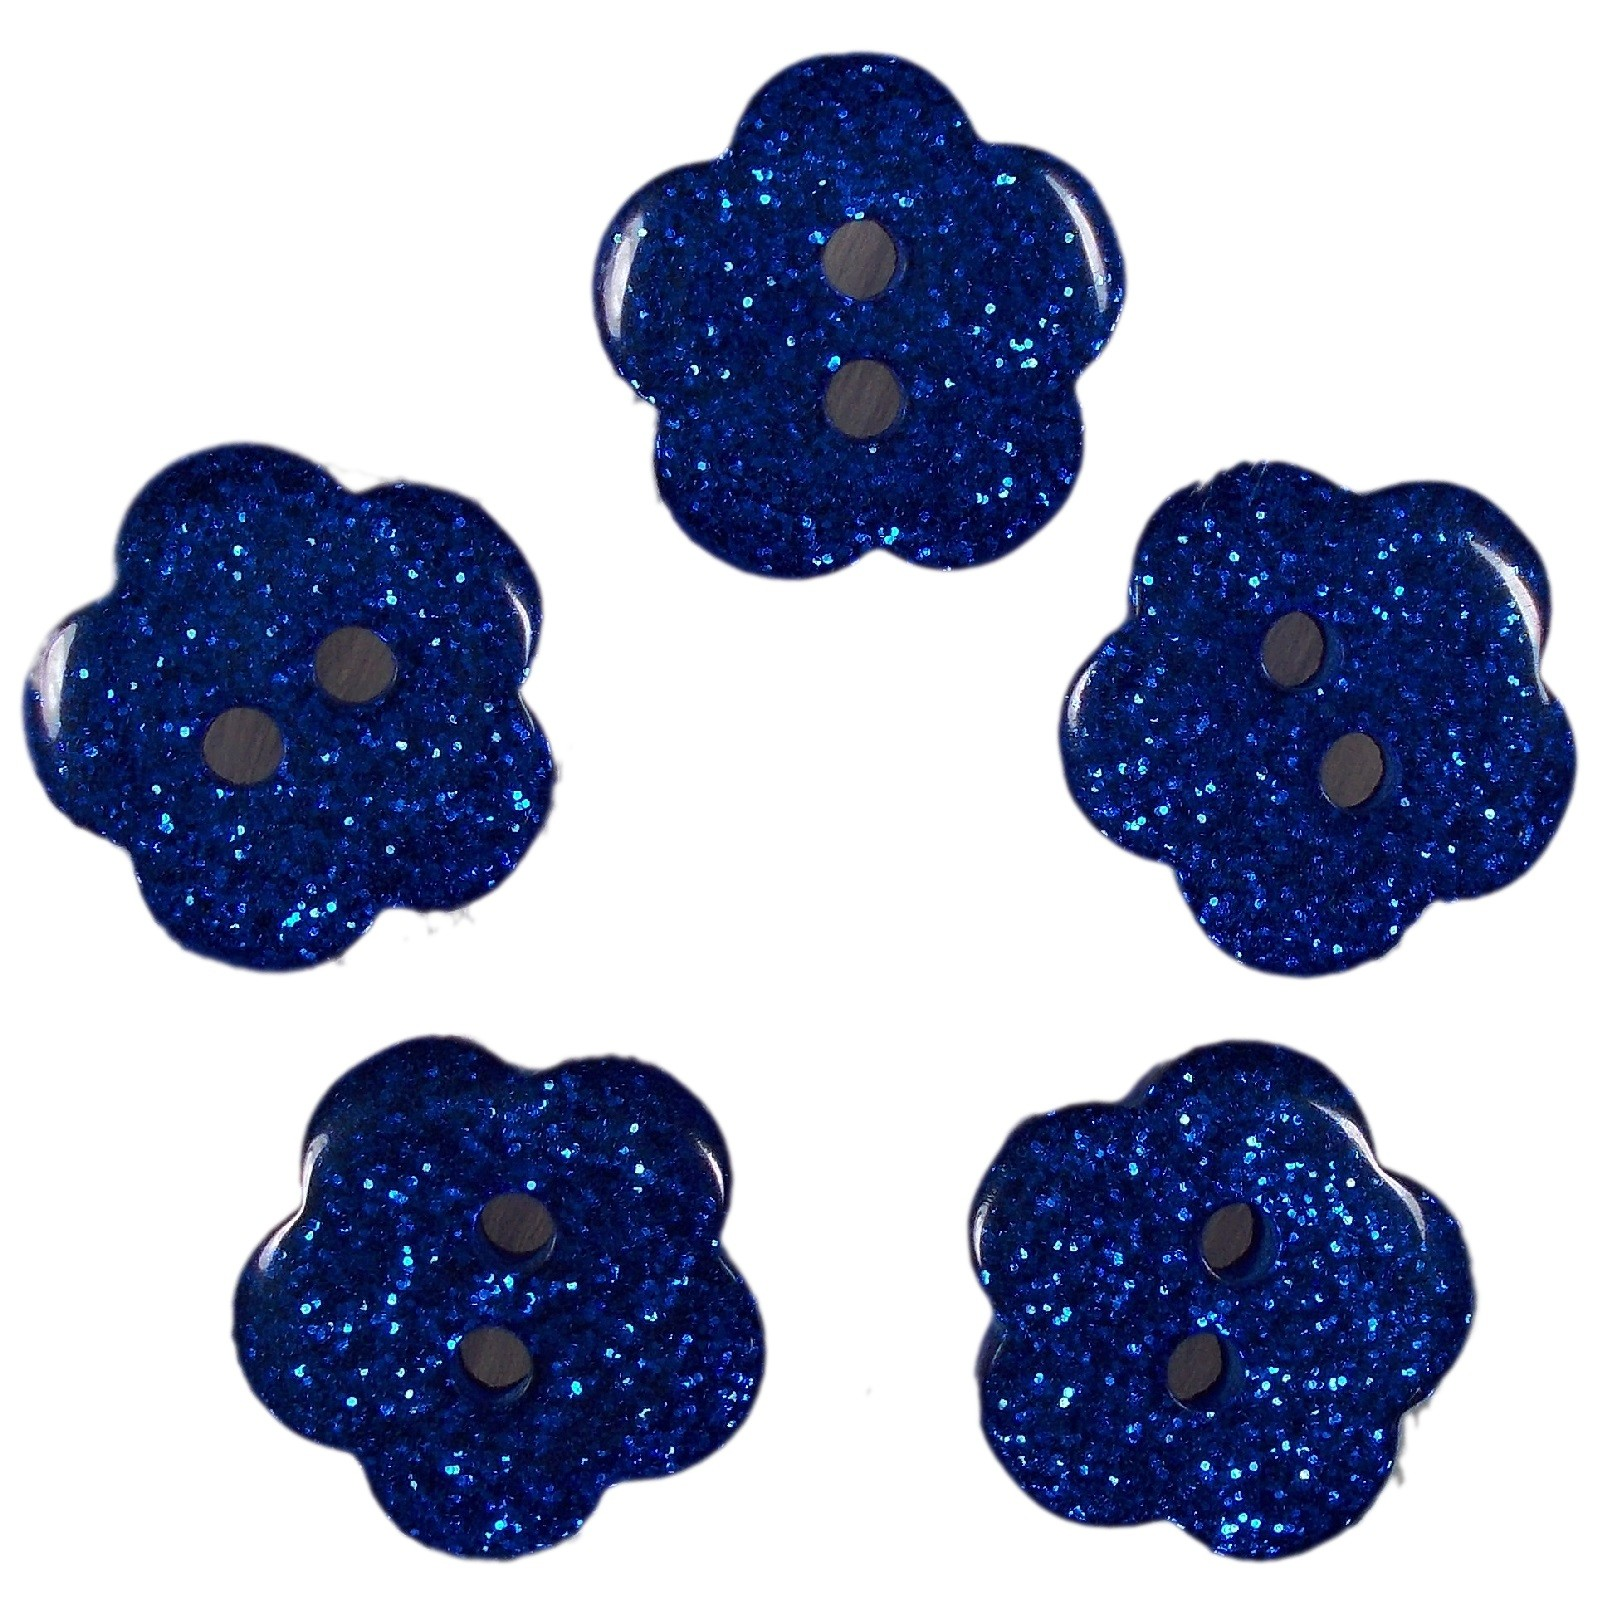 Colour Glitter Flower Shape Buttons 16mm Blue Pack of 5